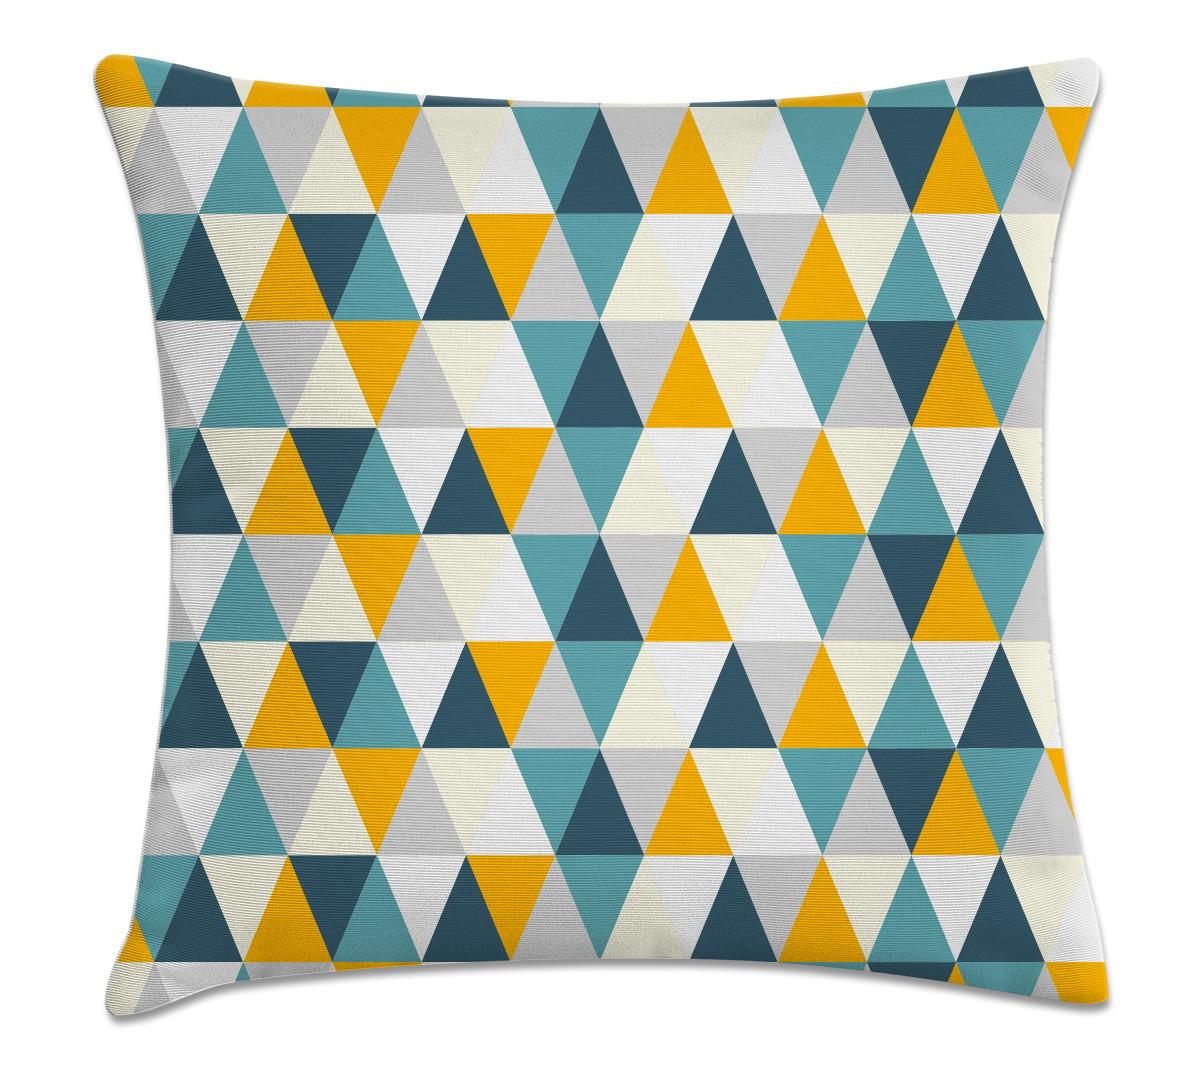 dd1273a7c85310 almofada triângulos amarelo cinza e azul